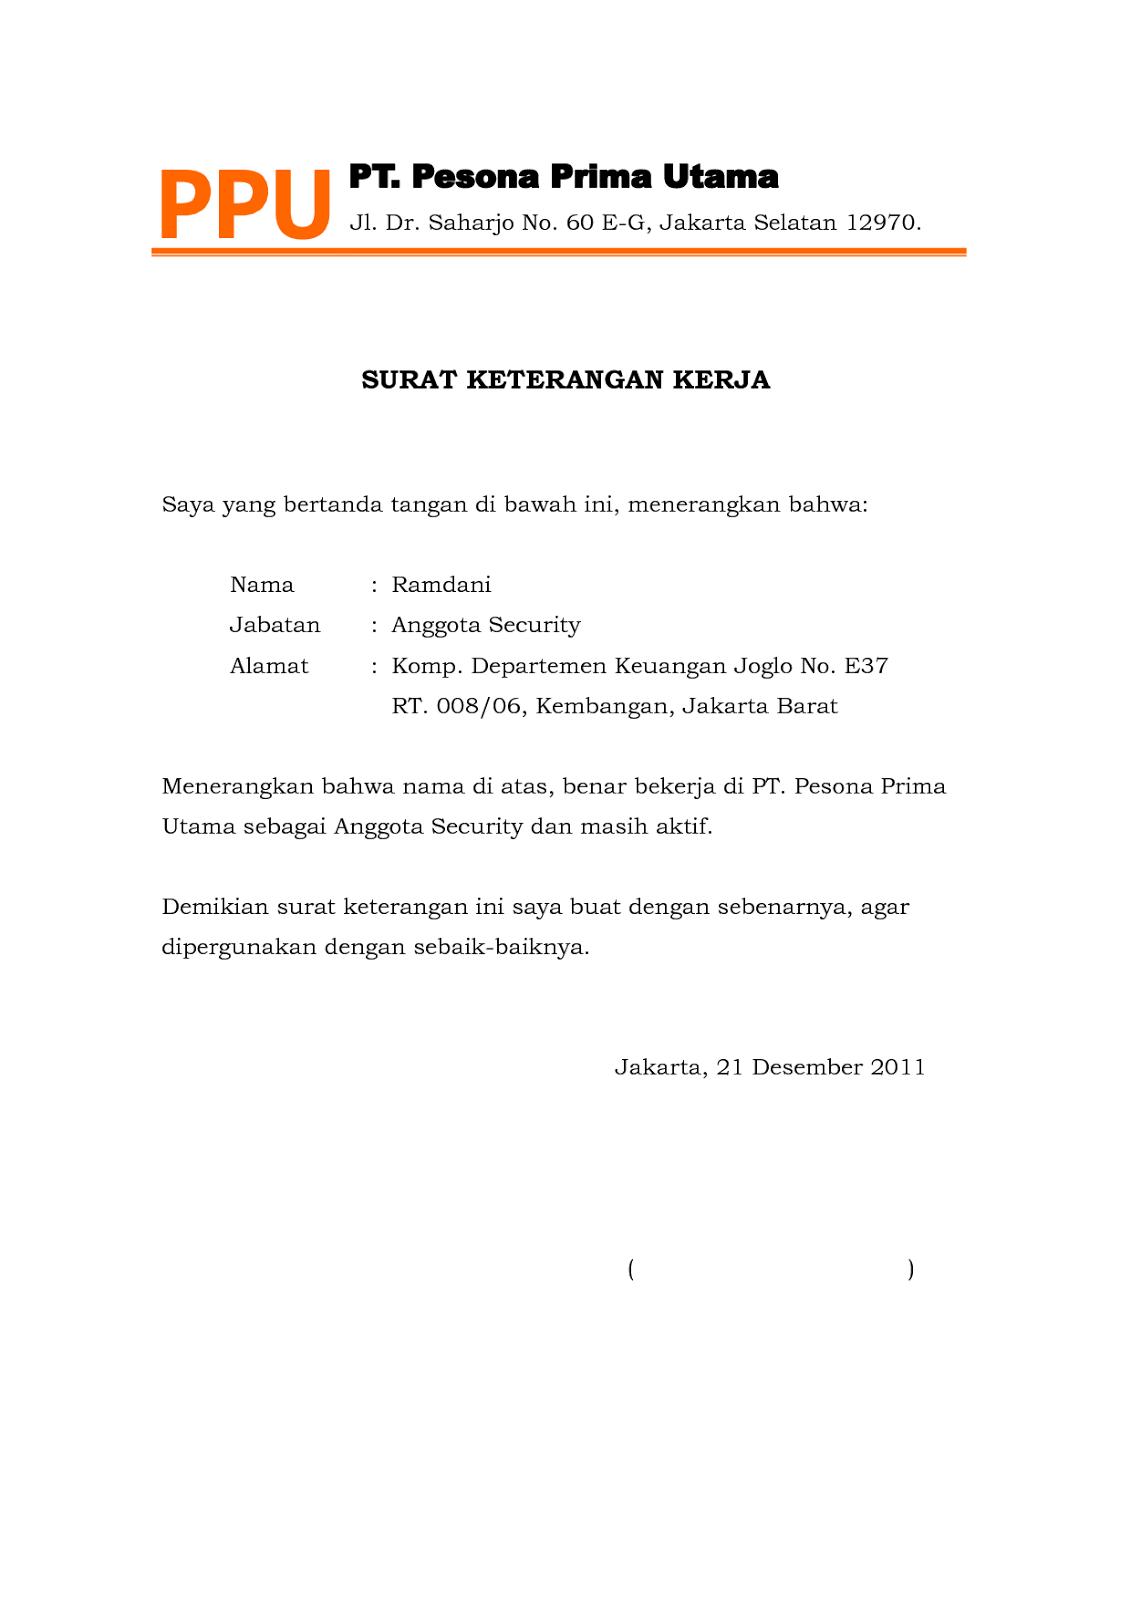 Lengkap Contoh Surat Keterangan Kerja Disertai File Doc